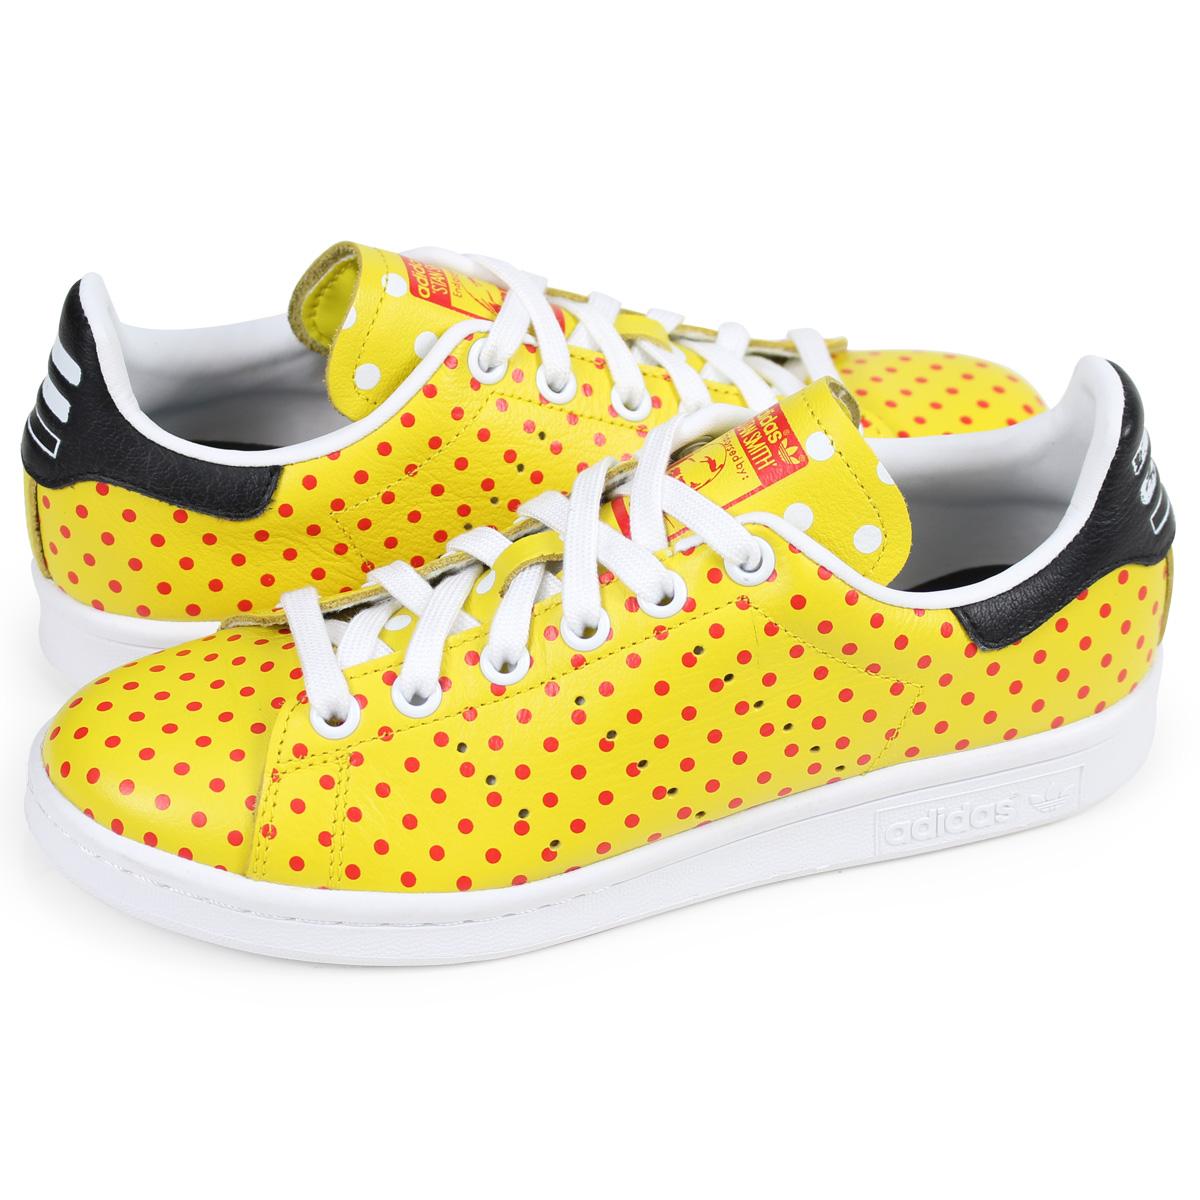 ebe856b75d010 adidas Originals PW STAN SMITH SPD Adidas Stan Smith sneakers Farrell  Williams Lady s collaboration B25402 yellow originals  3 15 Shinnyu load